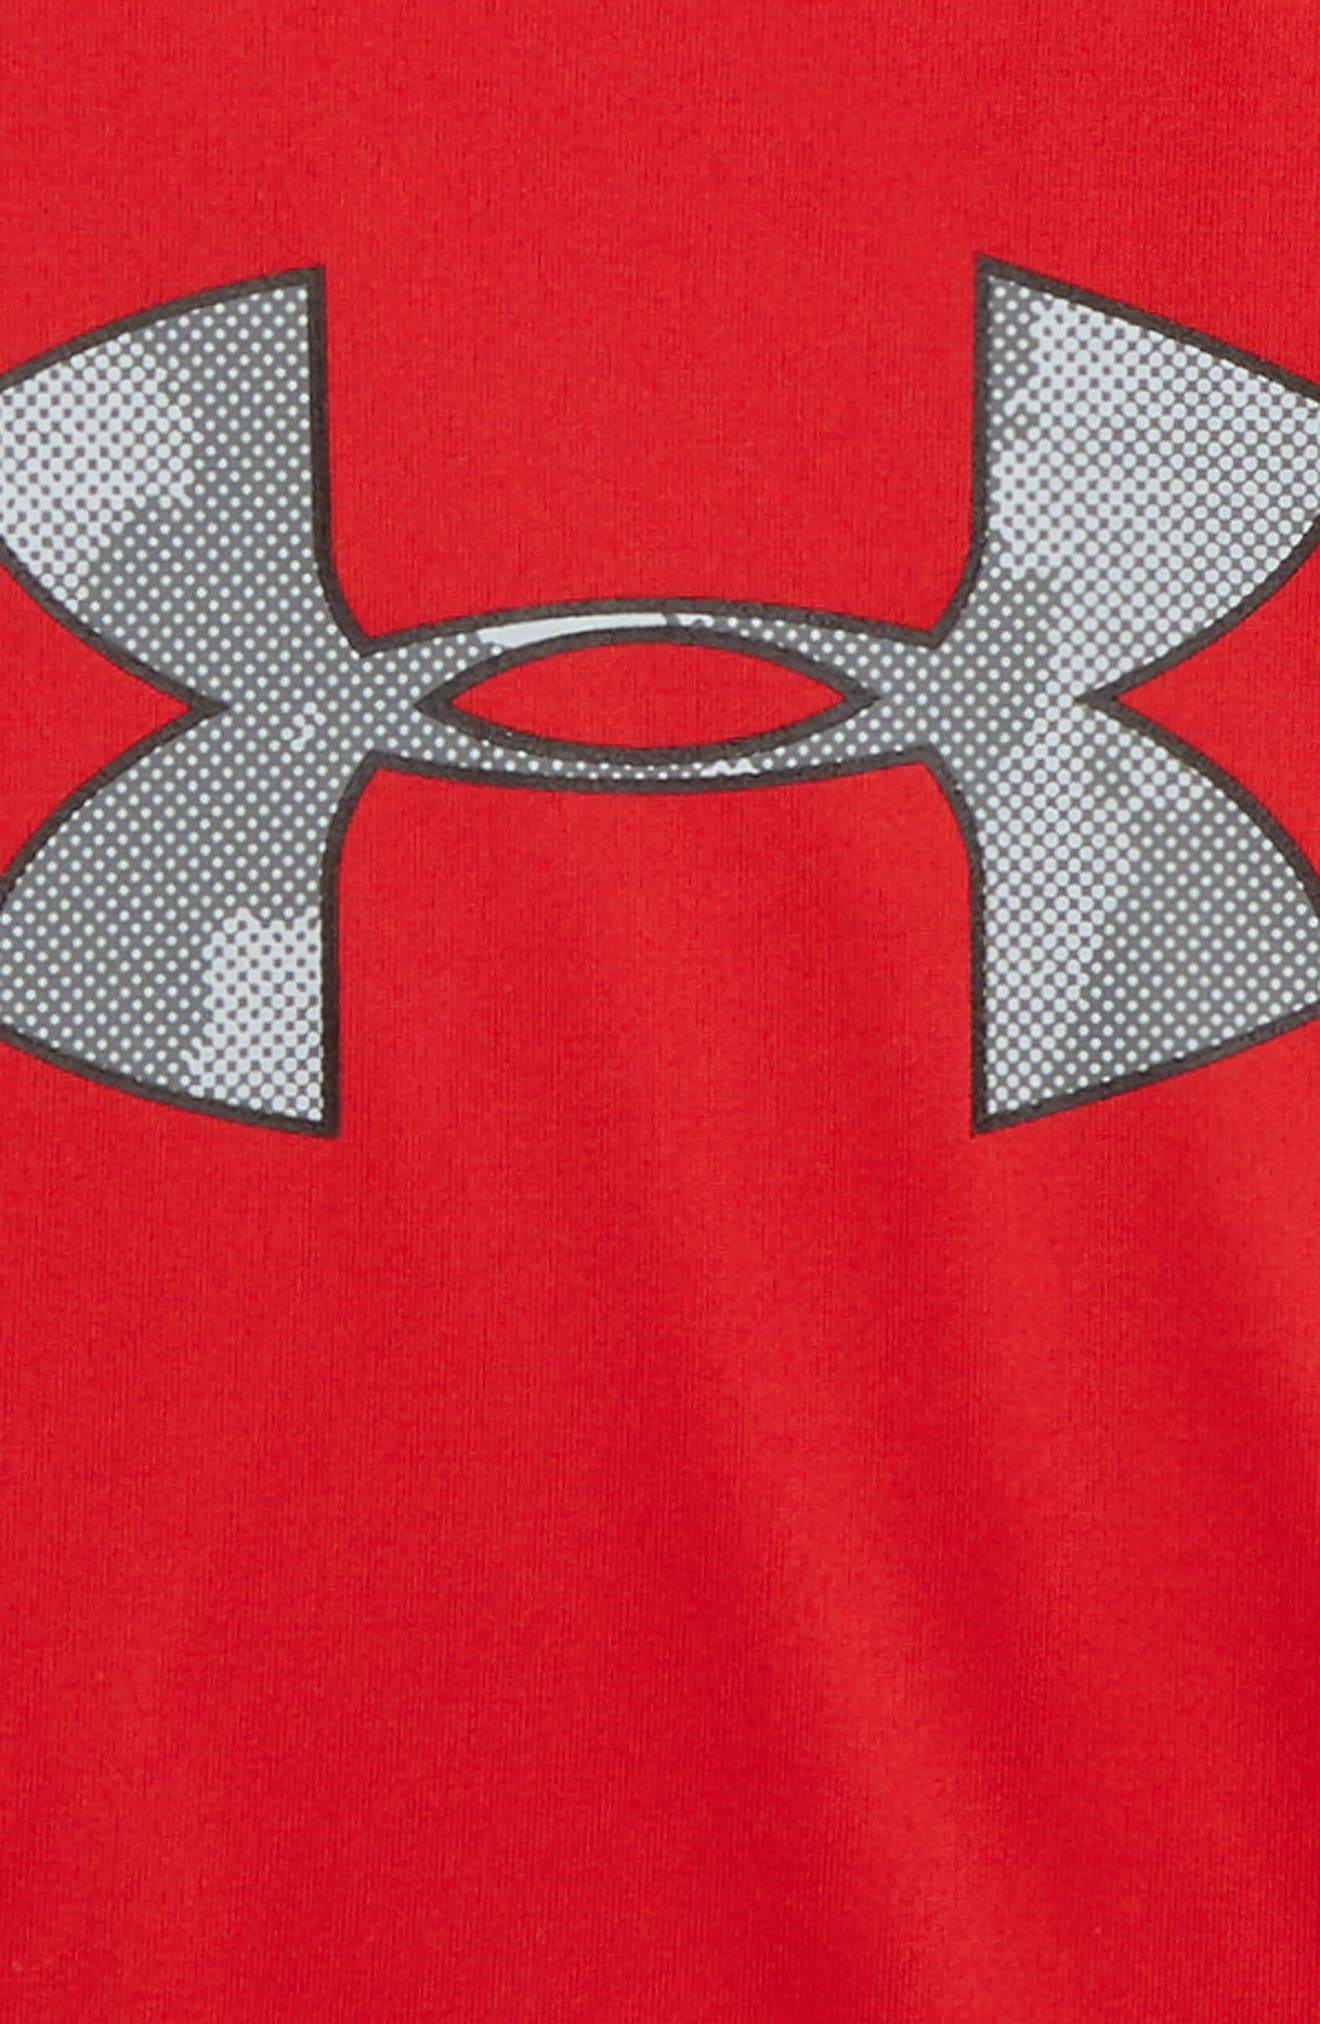 UNDER ARMOUR,                             Traverse Camo Logo T-Shirt,                             Alternate thumbnail 2, color,                             600